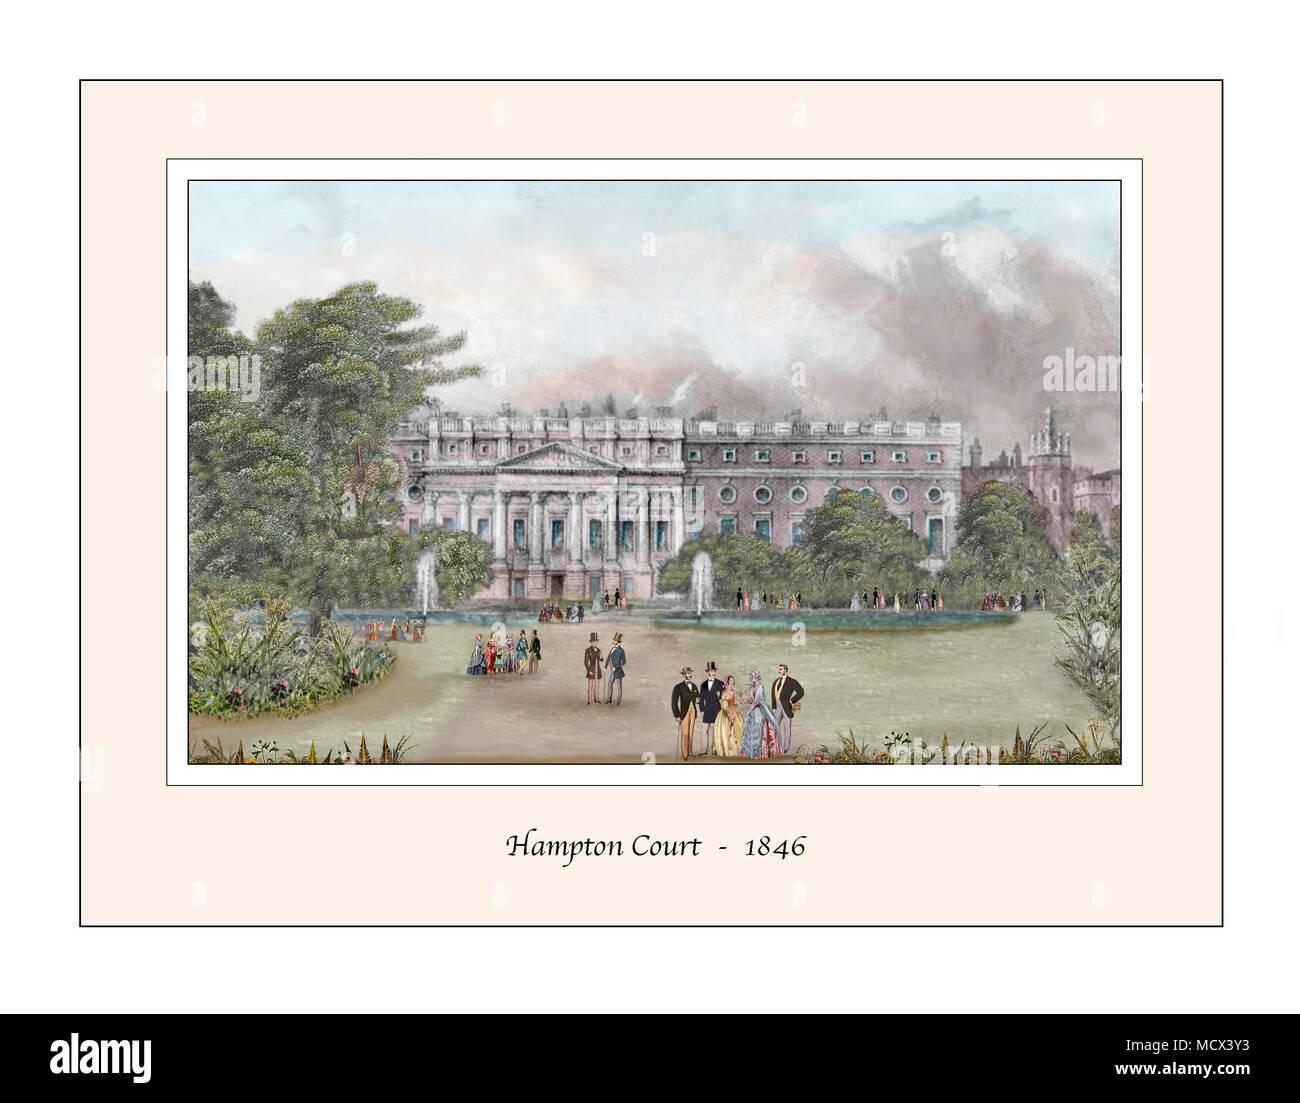 Hampton Court Original Design based on a 19th century Engraving - Stock Image